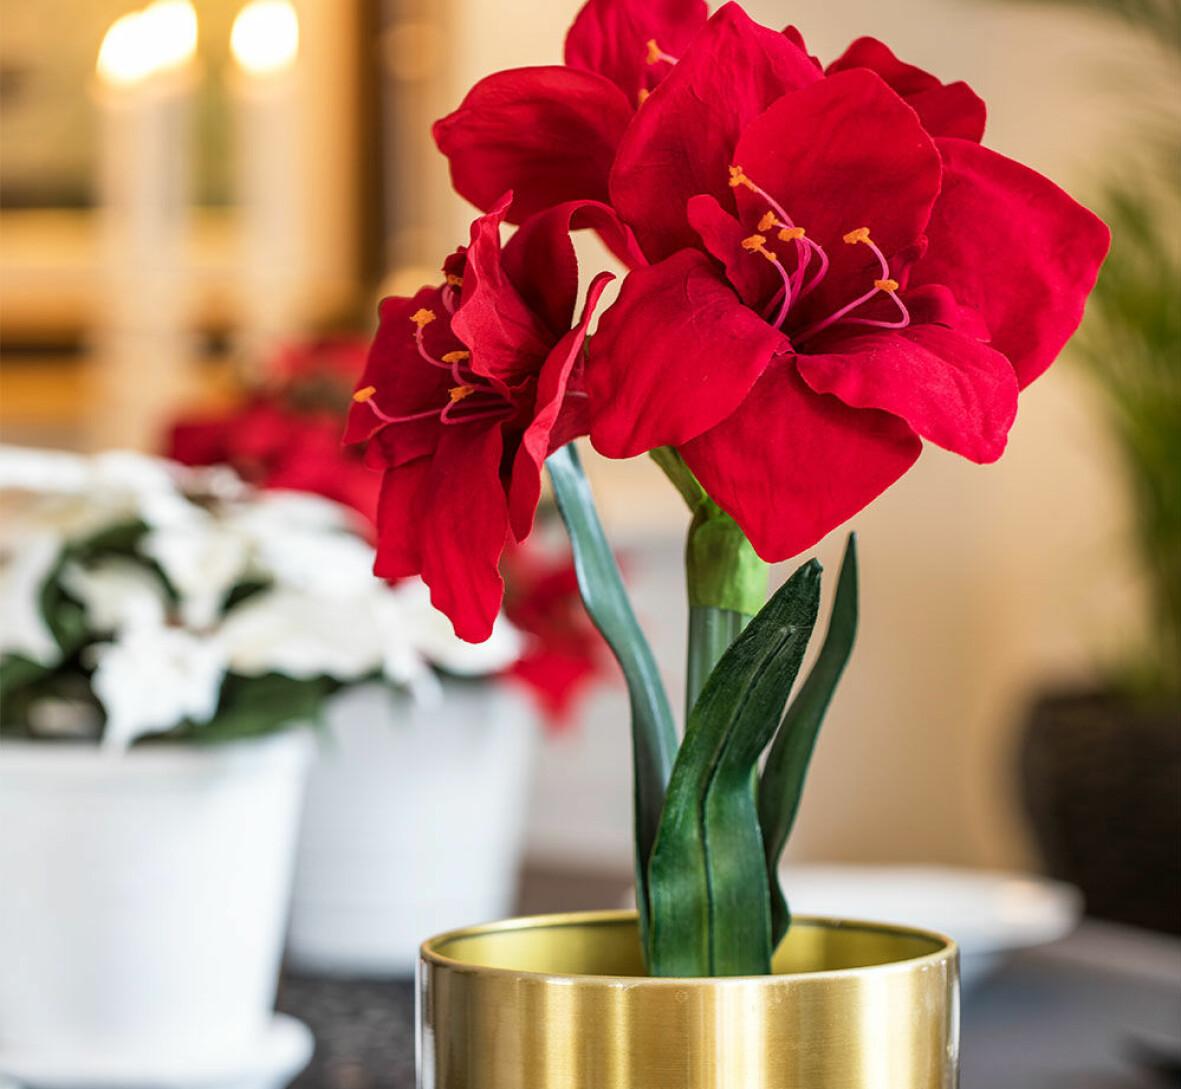 Konstgjord röd amaryllis i en guldkruka